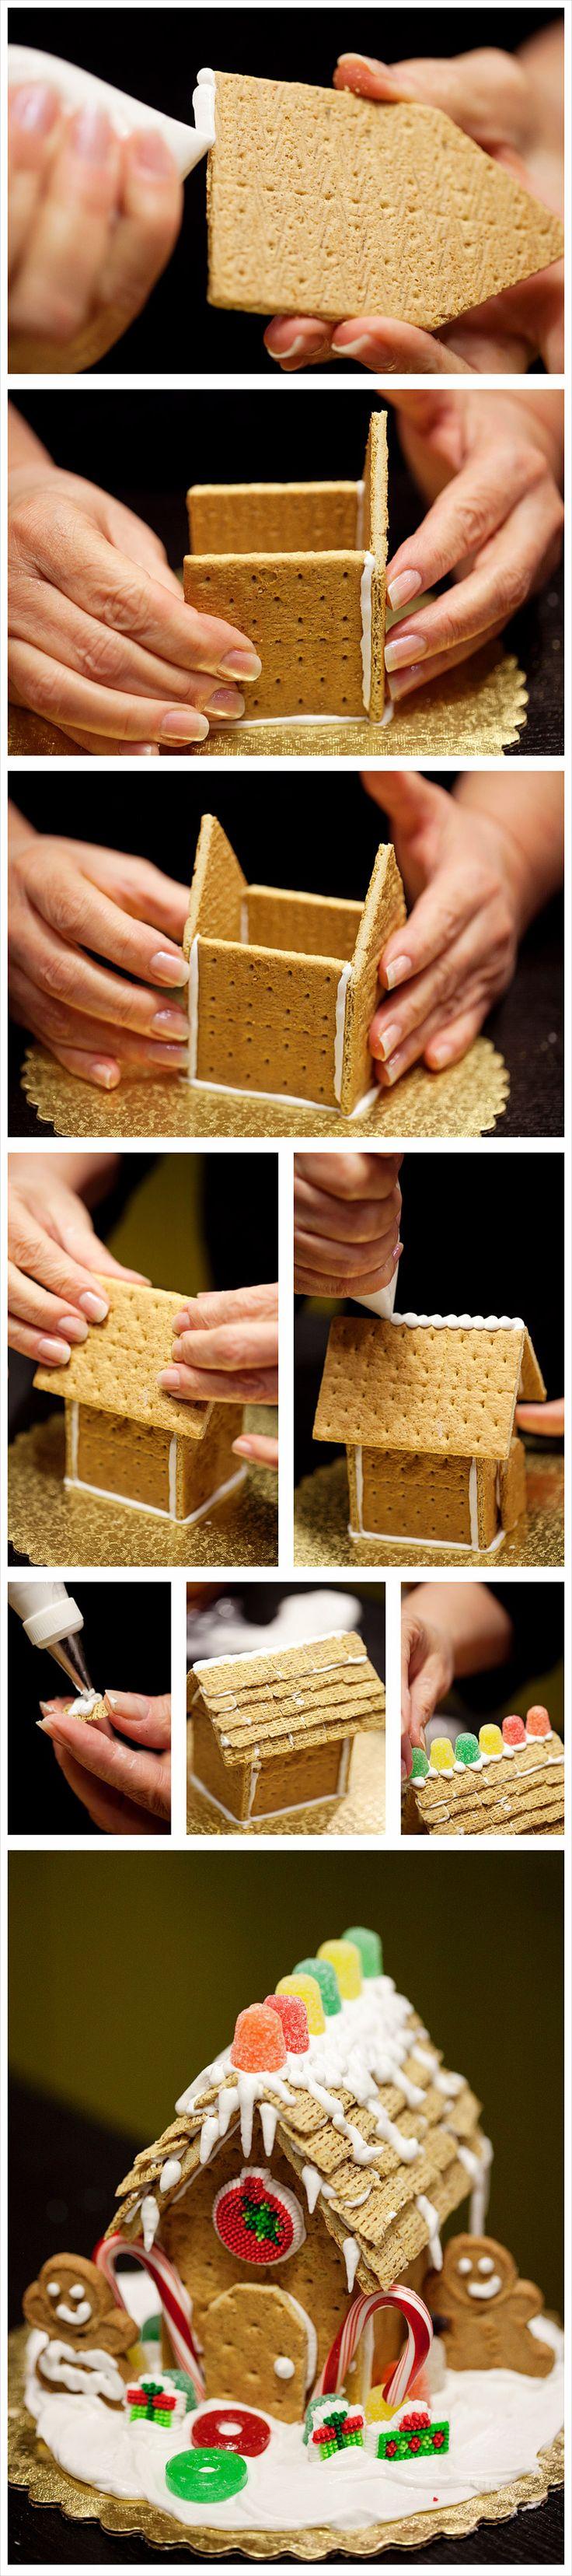 DIY Mini Gingerbread House: